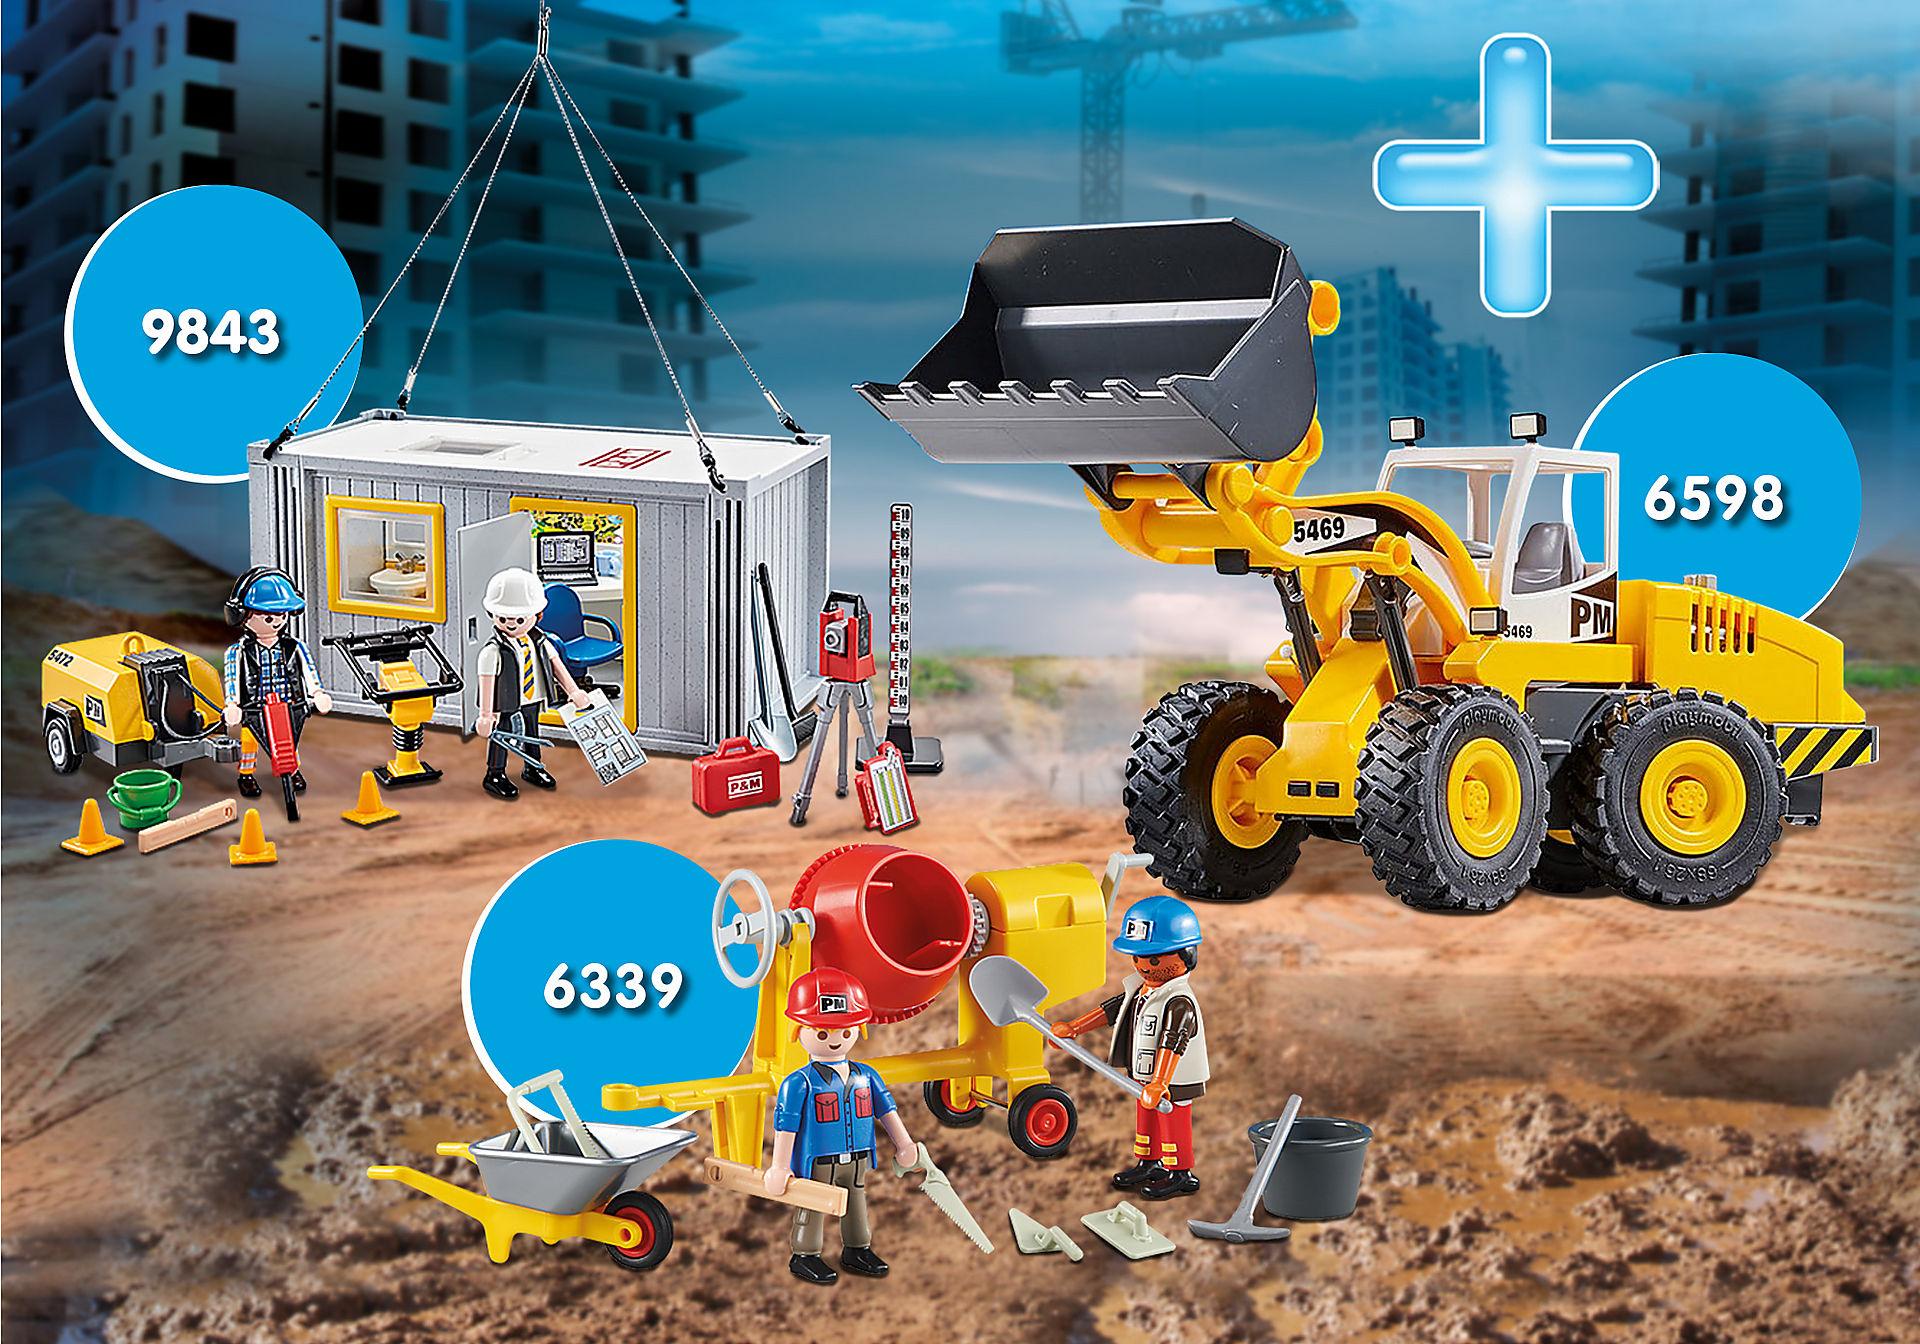 http://media.playmobil.com/i/playmobil/PM1911G_product_detail/Bundel Bouw